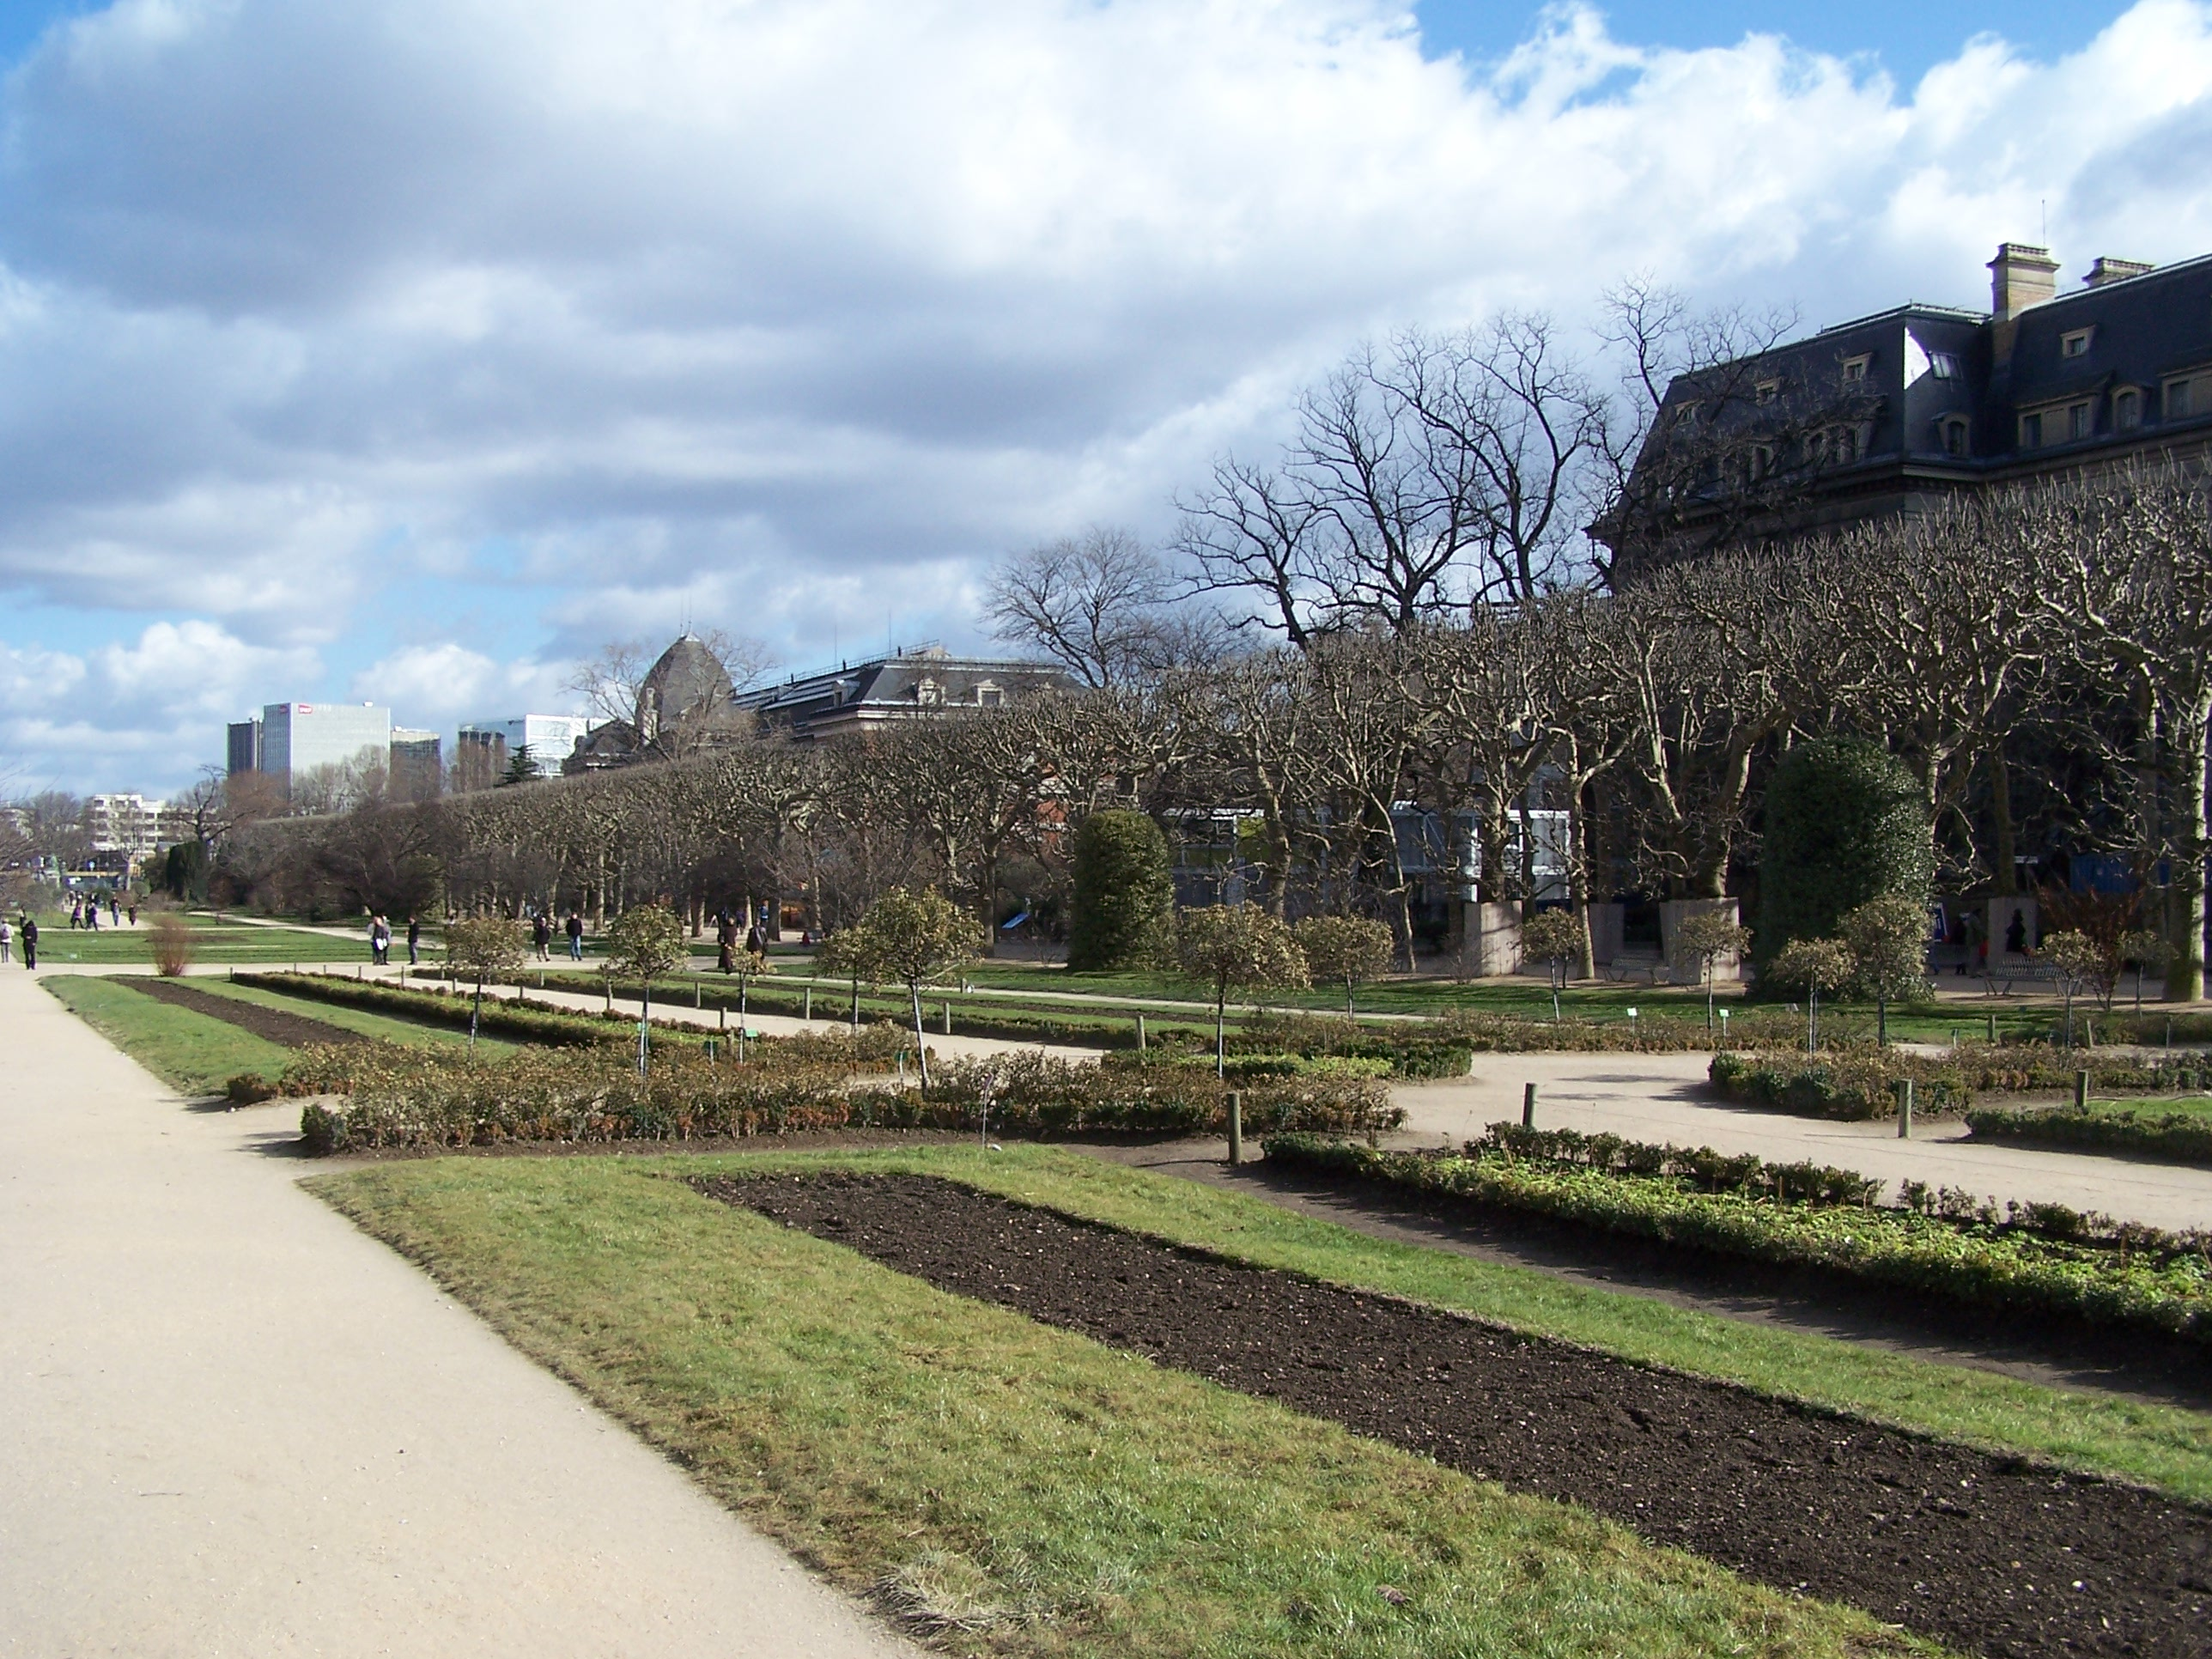 File:Jardin des Plantes vue hiver 2012.JPG - Wikimedia Commons